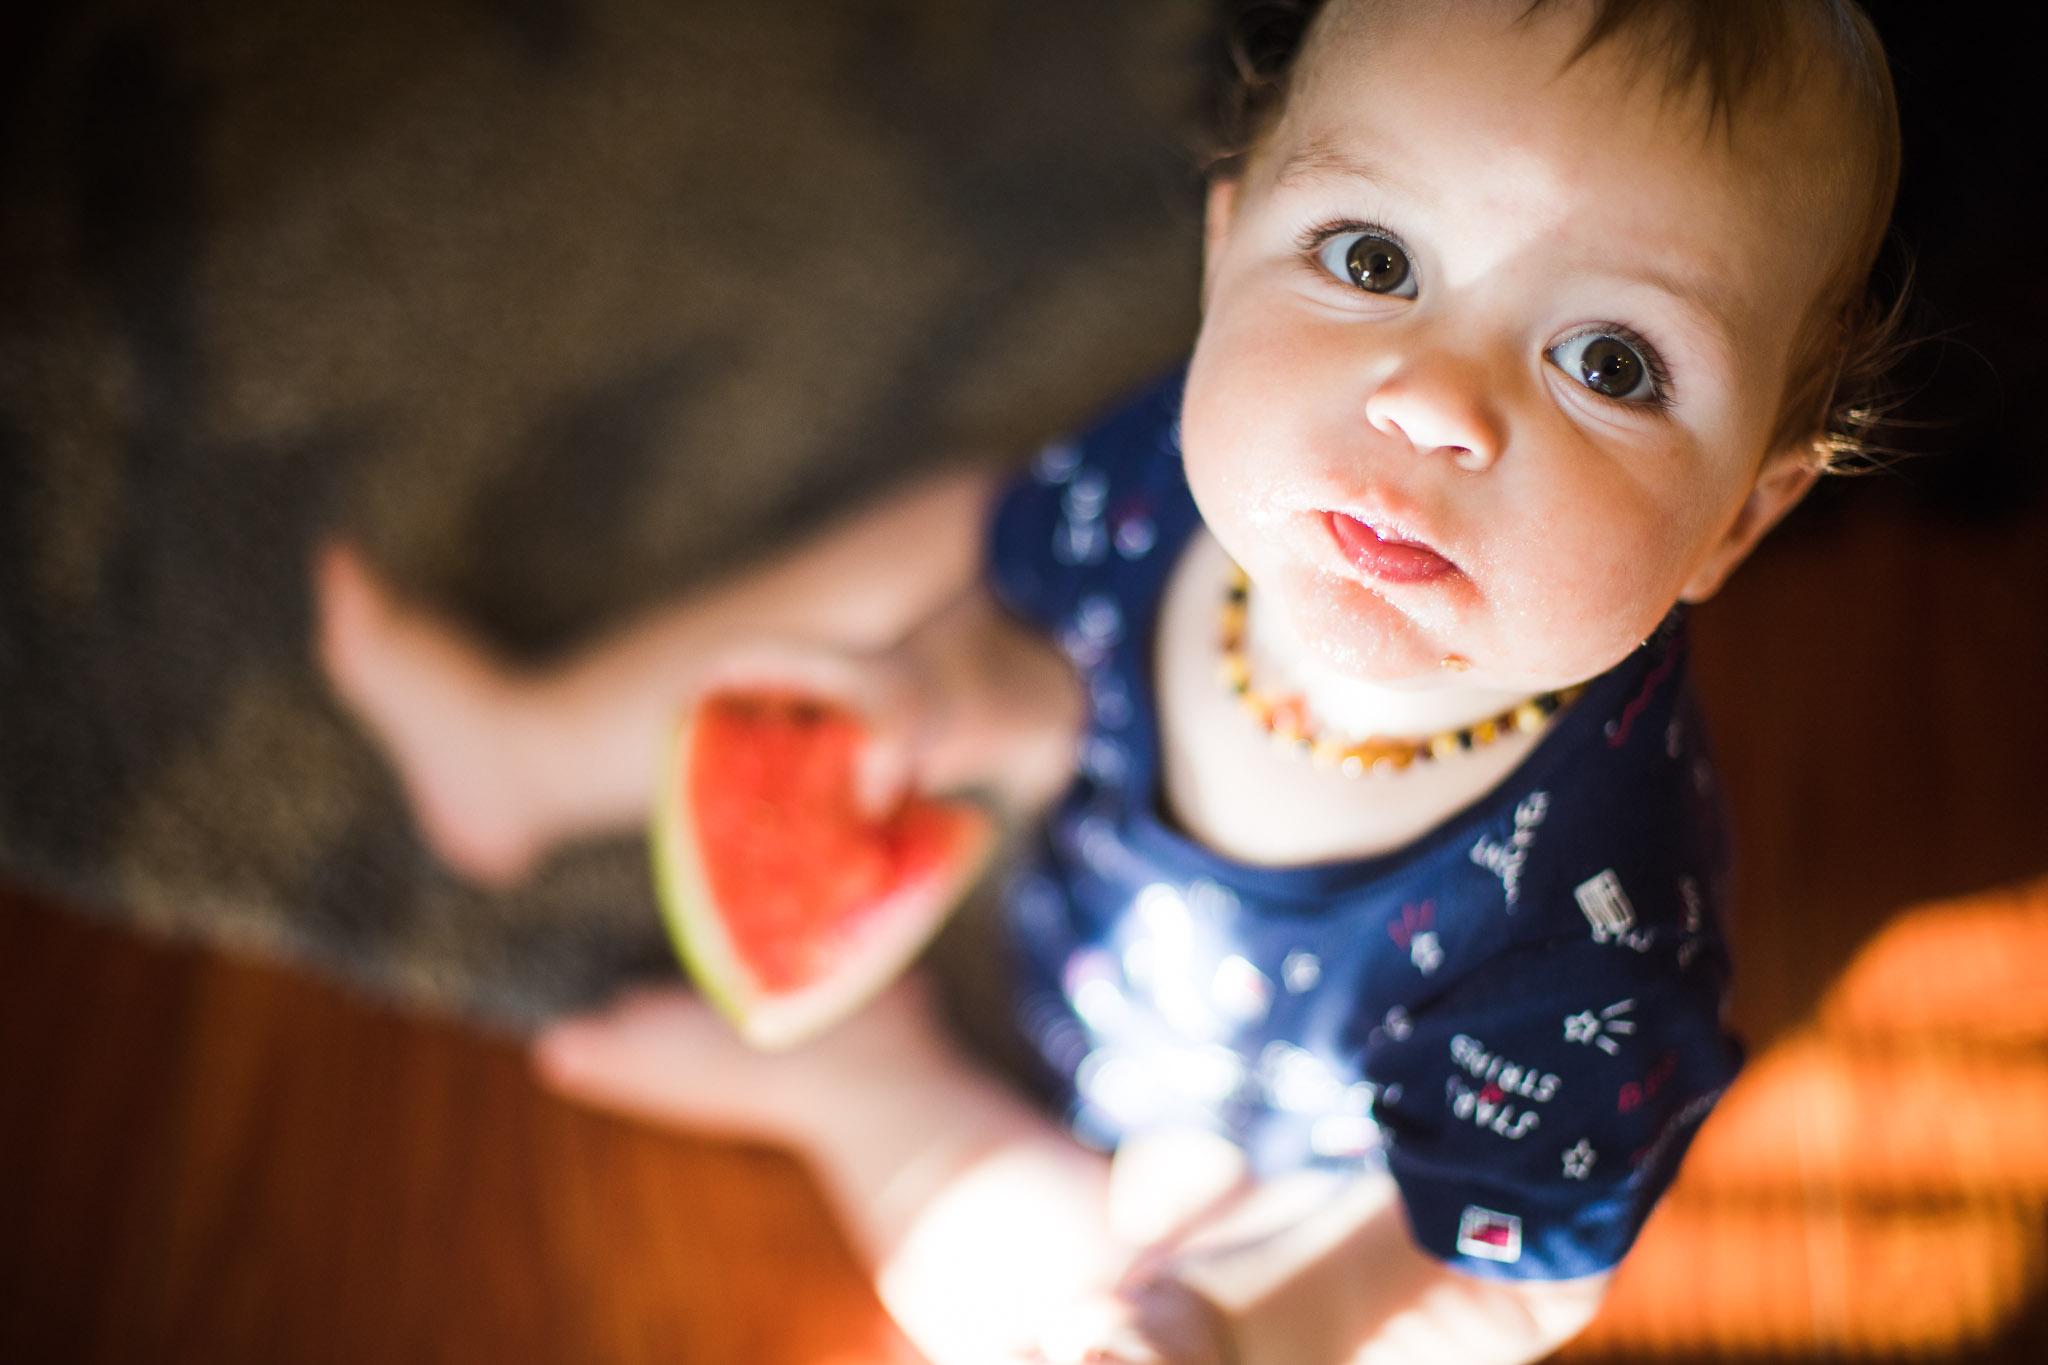 Archer_Inspired_Photography_Watermelon_Baby_Boy_Eating_Lifestyle_Photographer_California-13.jpg